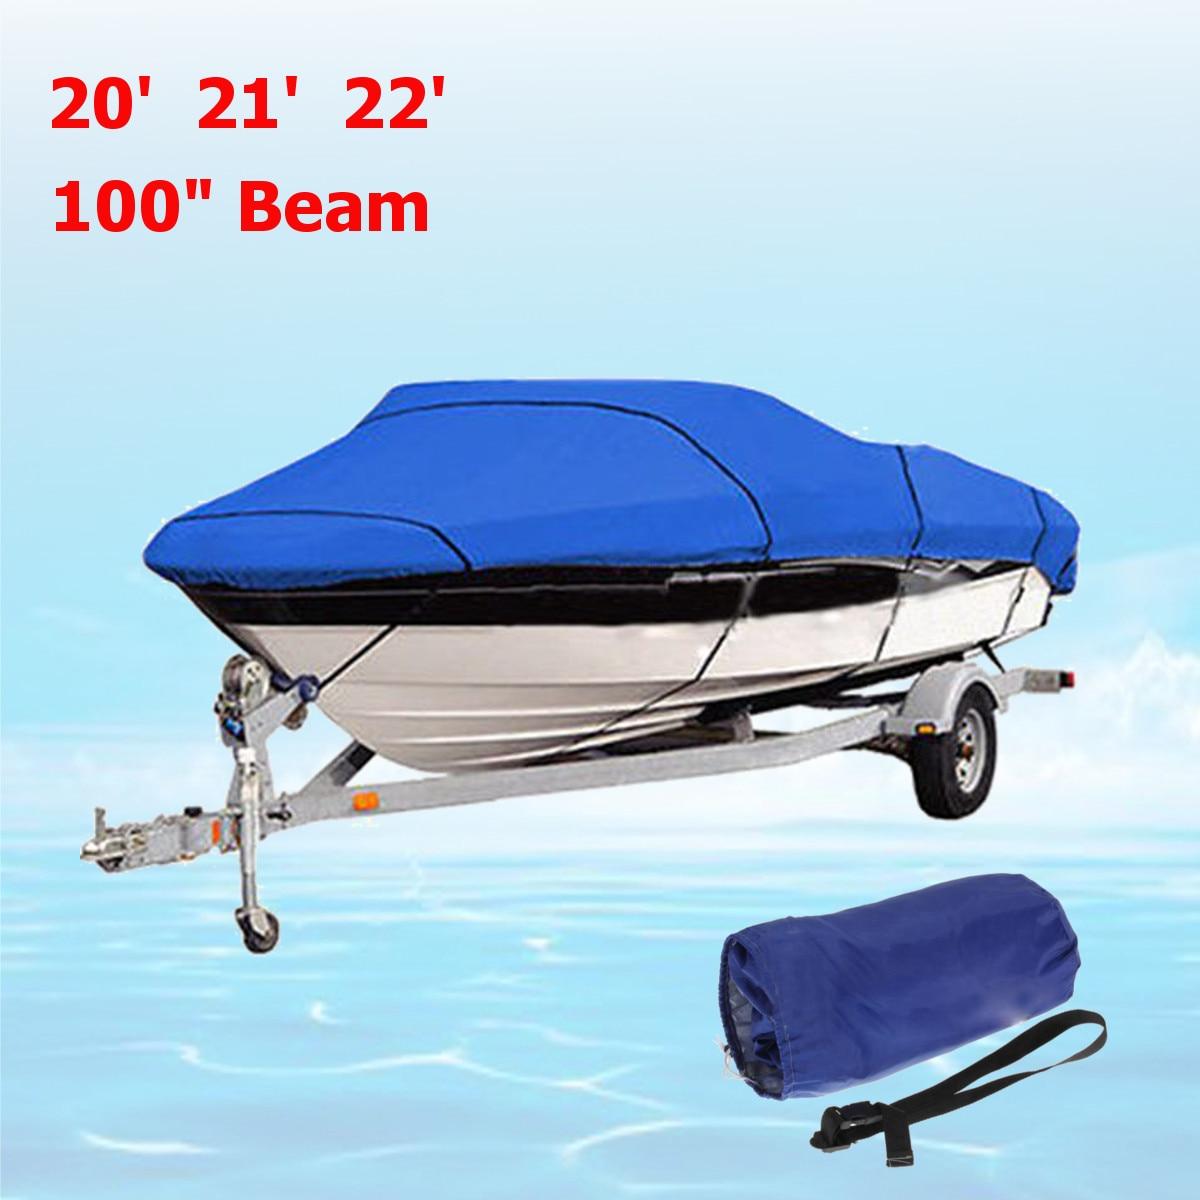 Heavy Duty Fishing Ski Runboat Boat COVER 20-22 Ft 100inch Beam V-Hull Waterproof Blue Waterproof Kit